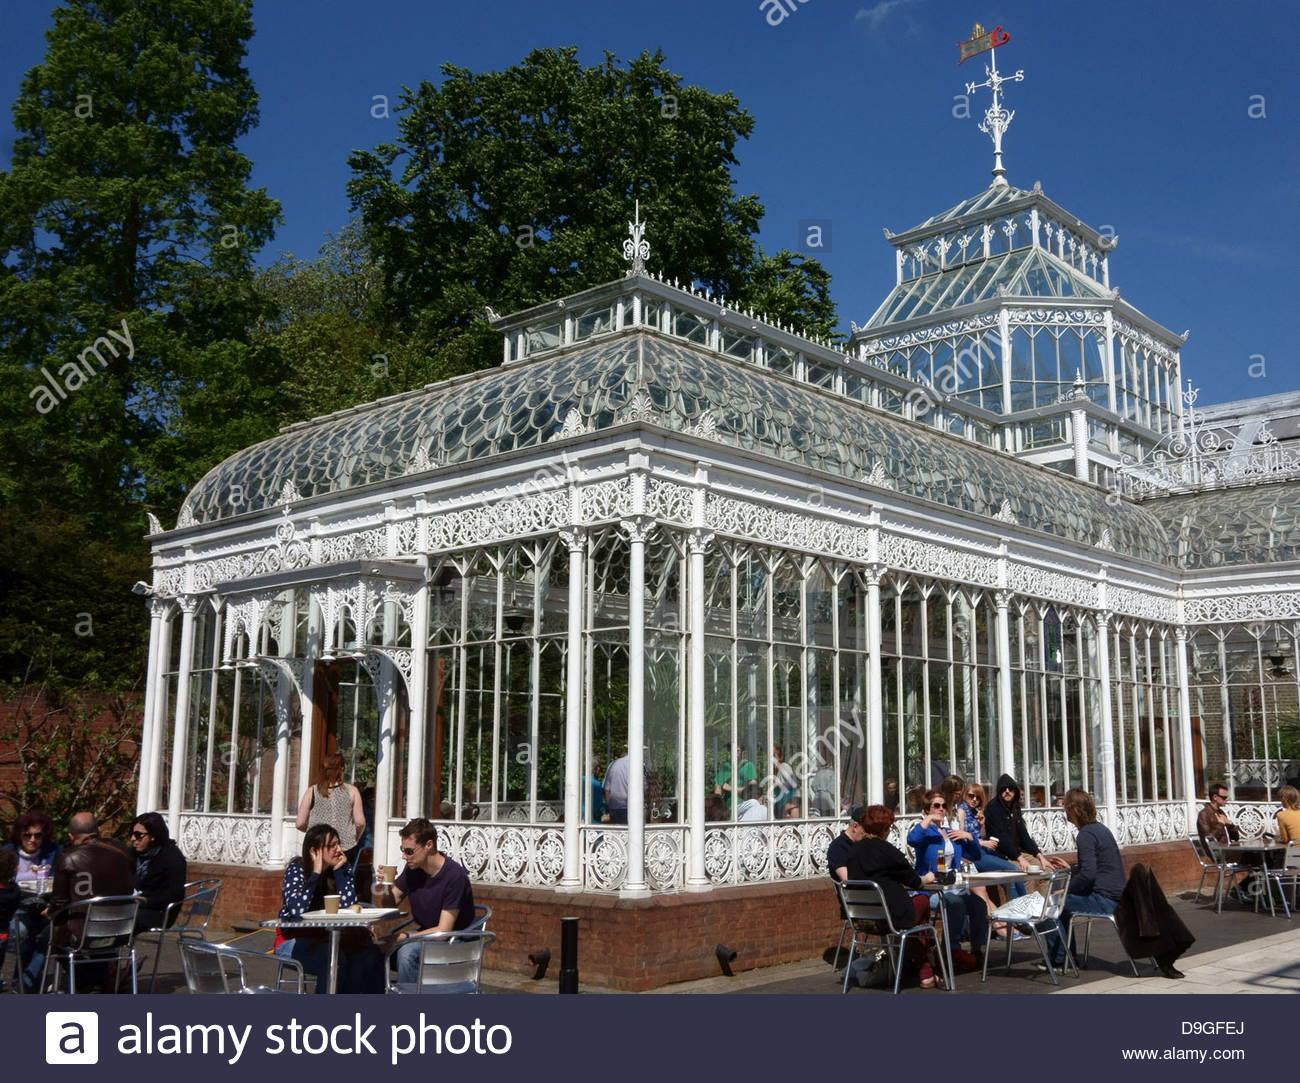 Horniman museum gardens - Stock Photo The Conservatory At The Horniman Museum Gardens South London